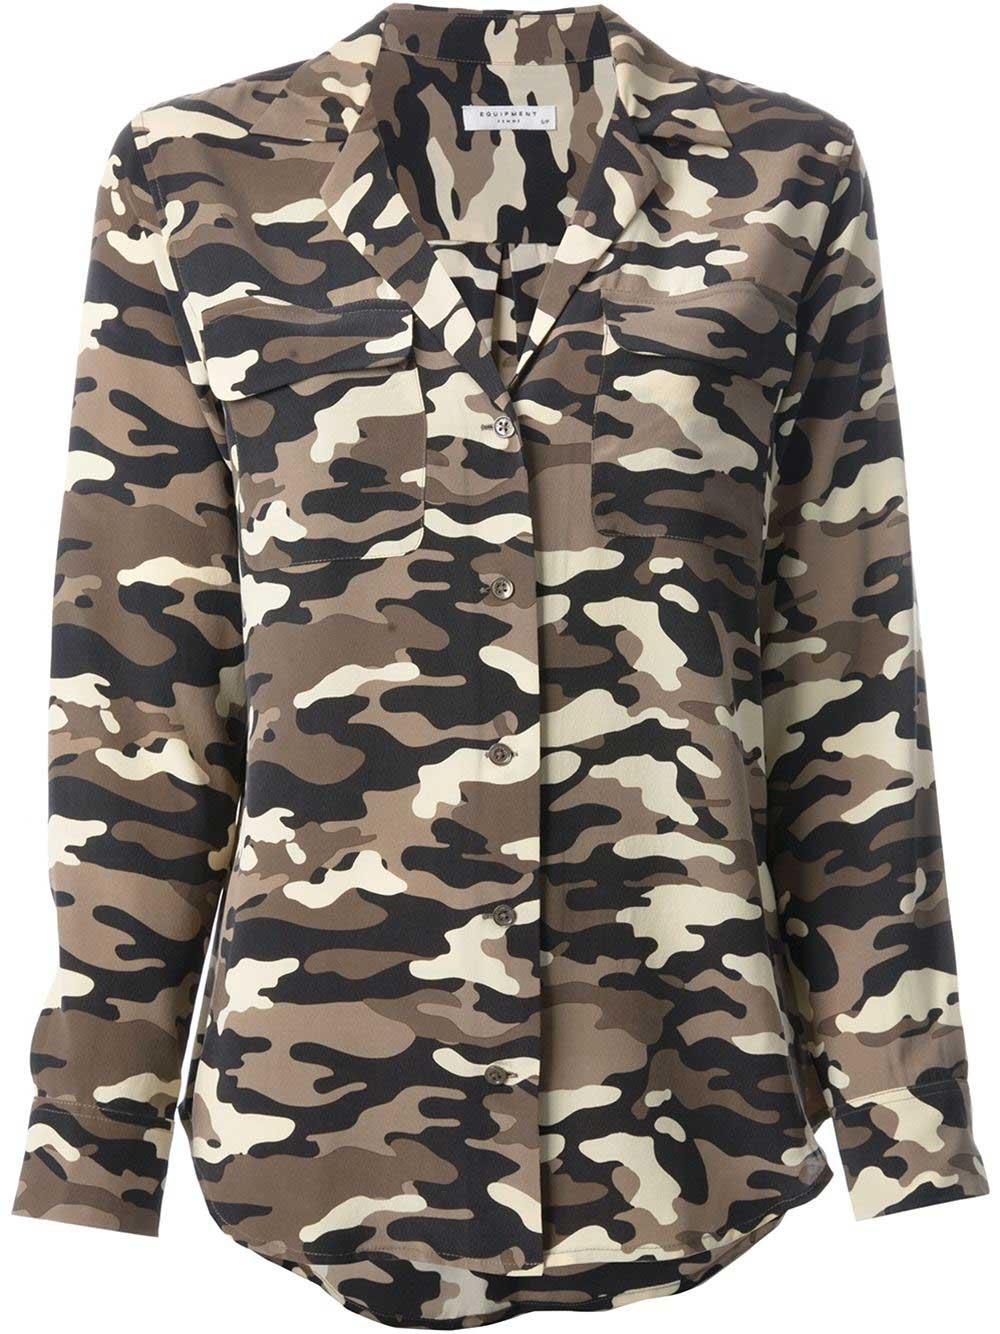 Equipment - Chemise imprimée camouflage (369 €)